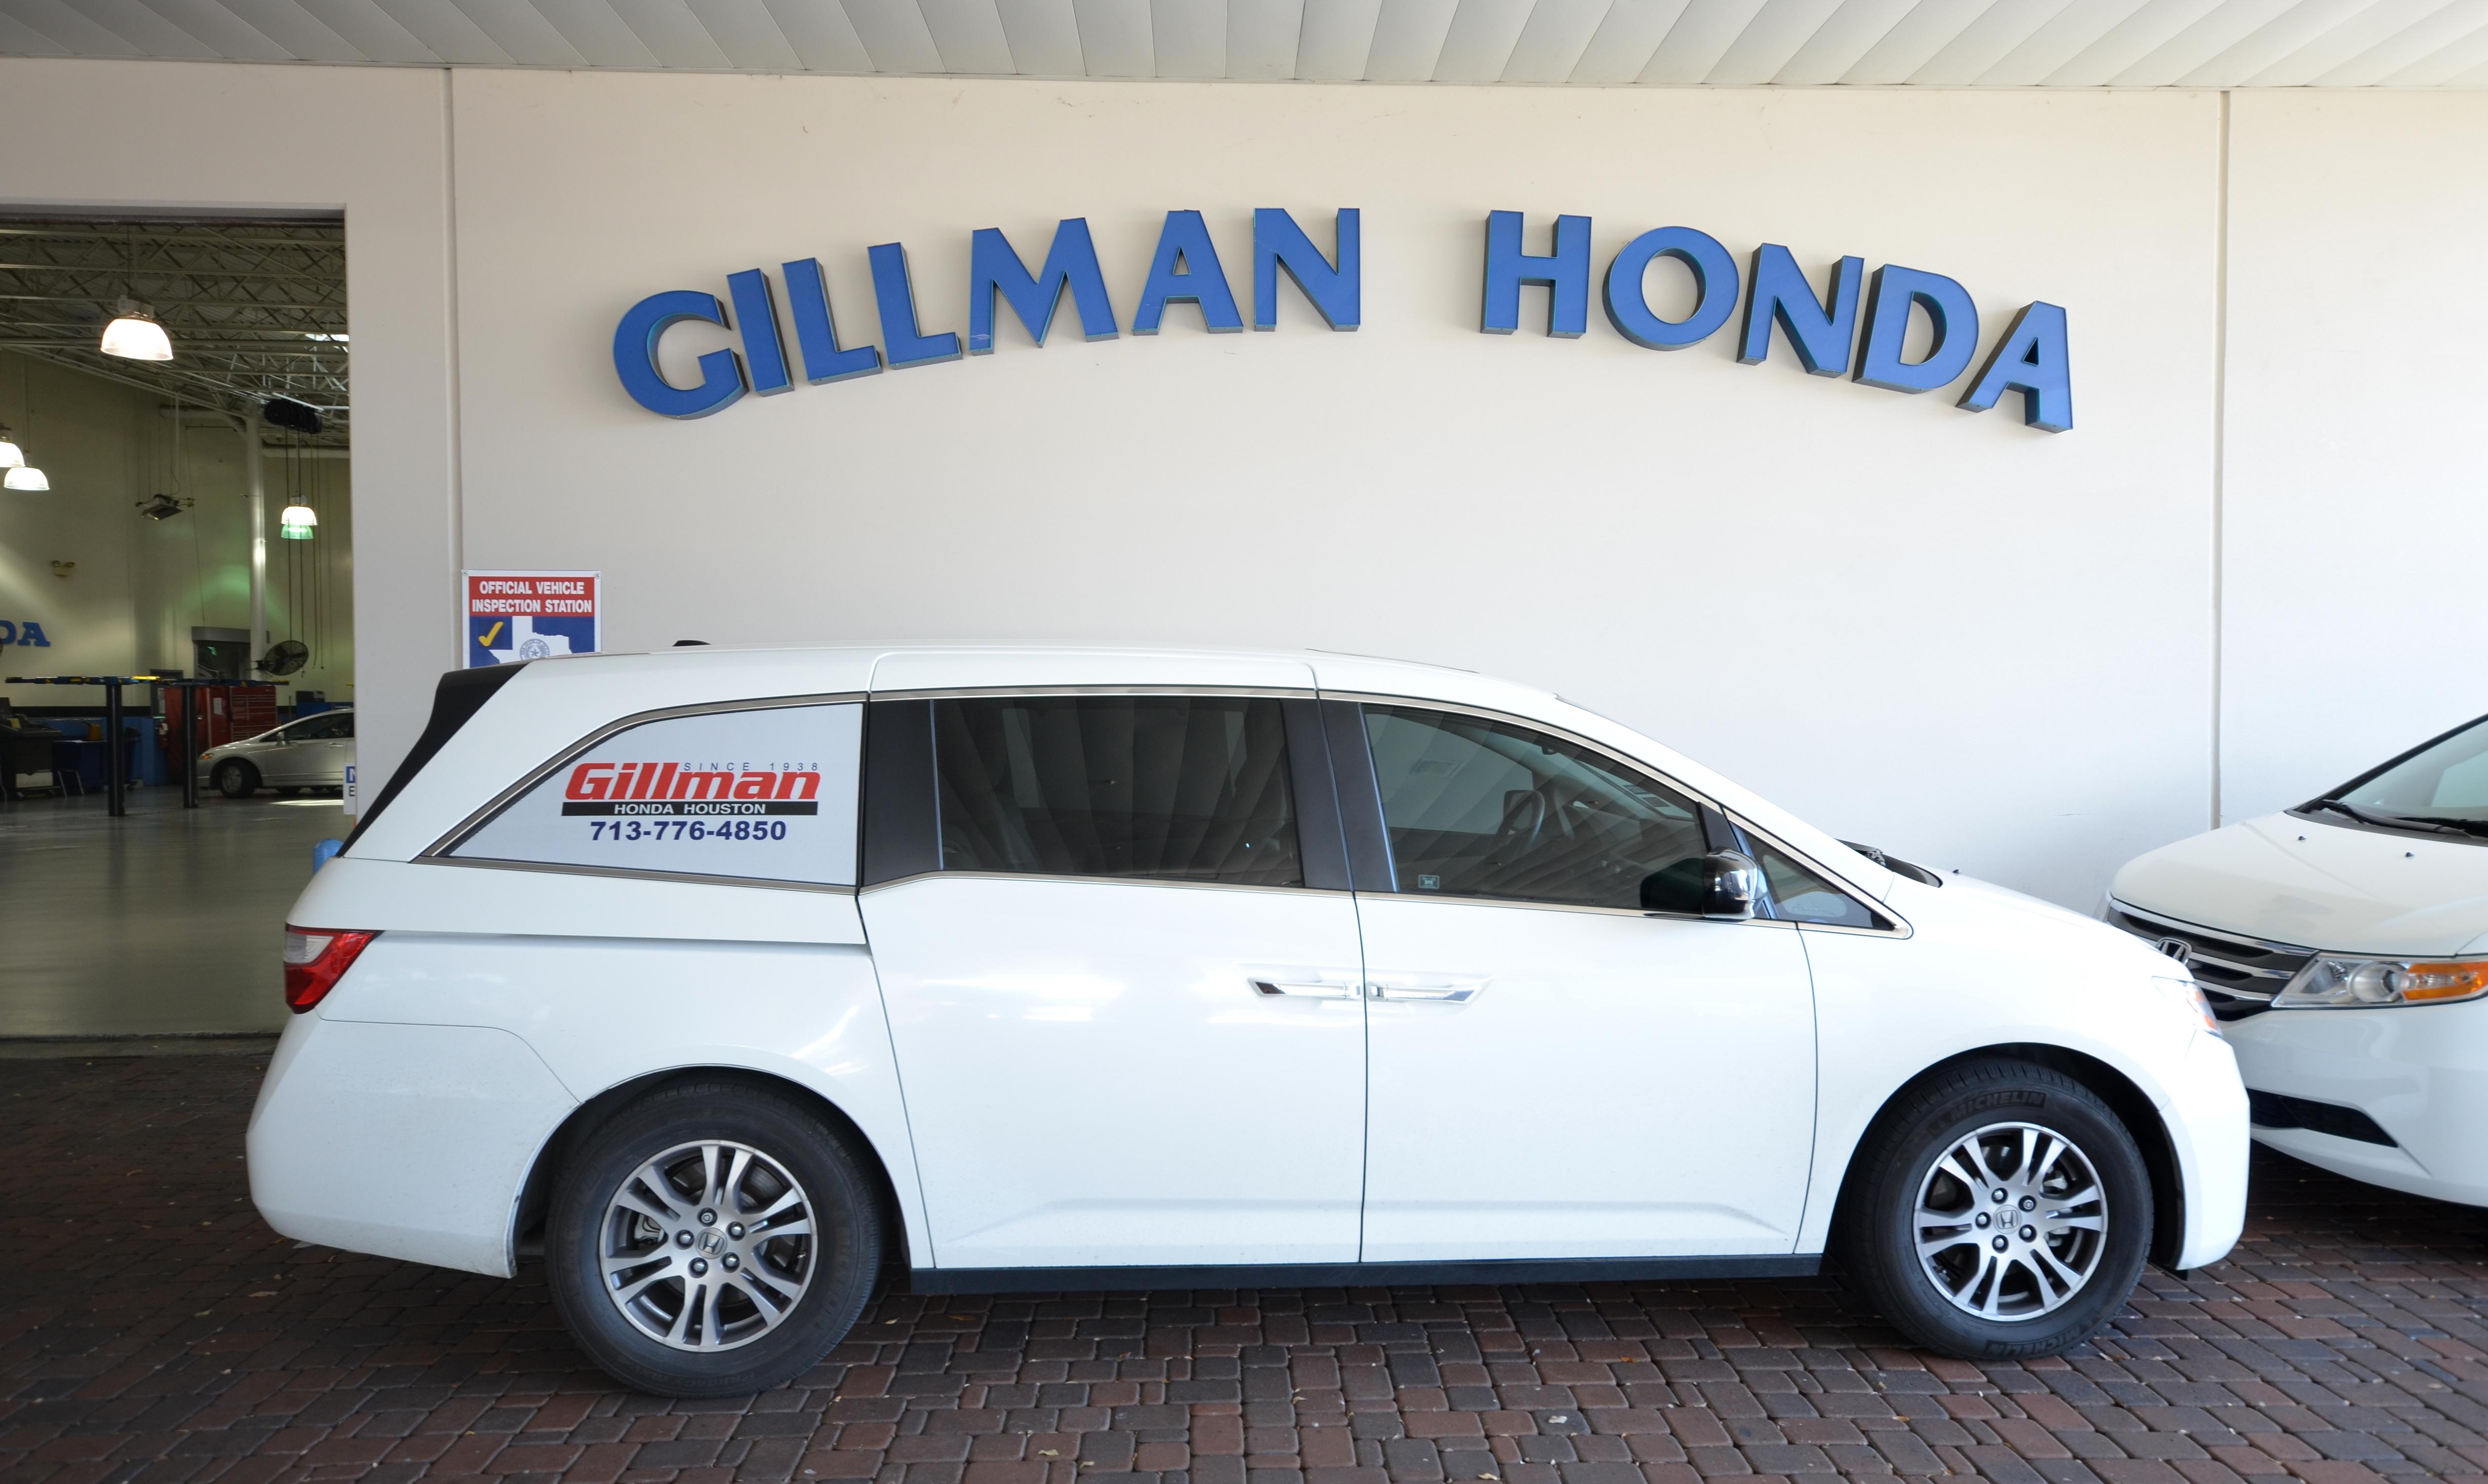 Gillman honda houston in houston tx 77099 for Honda of houston